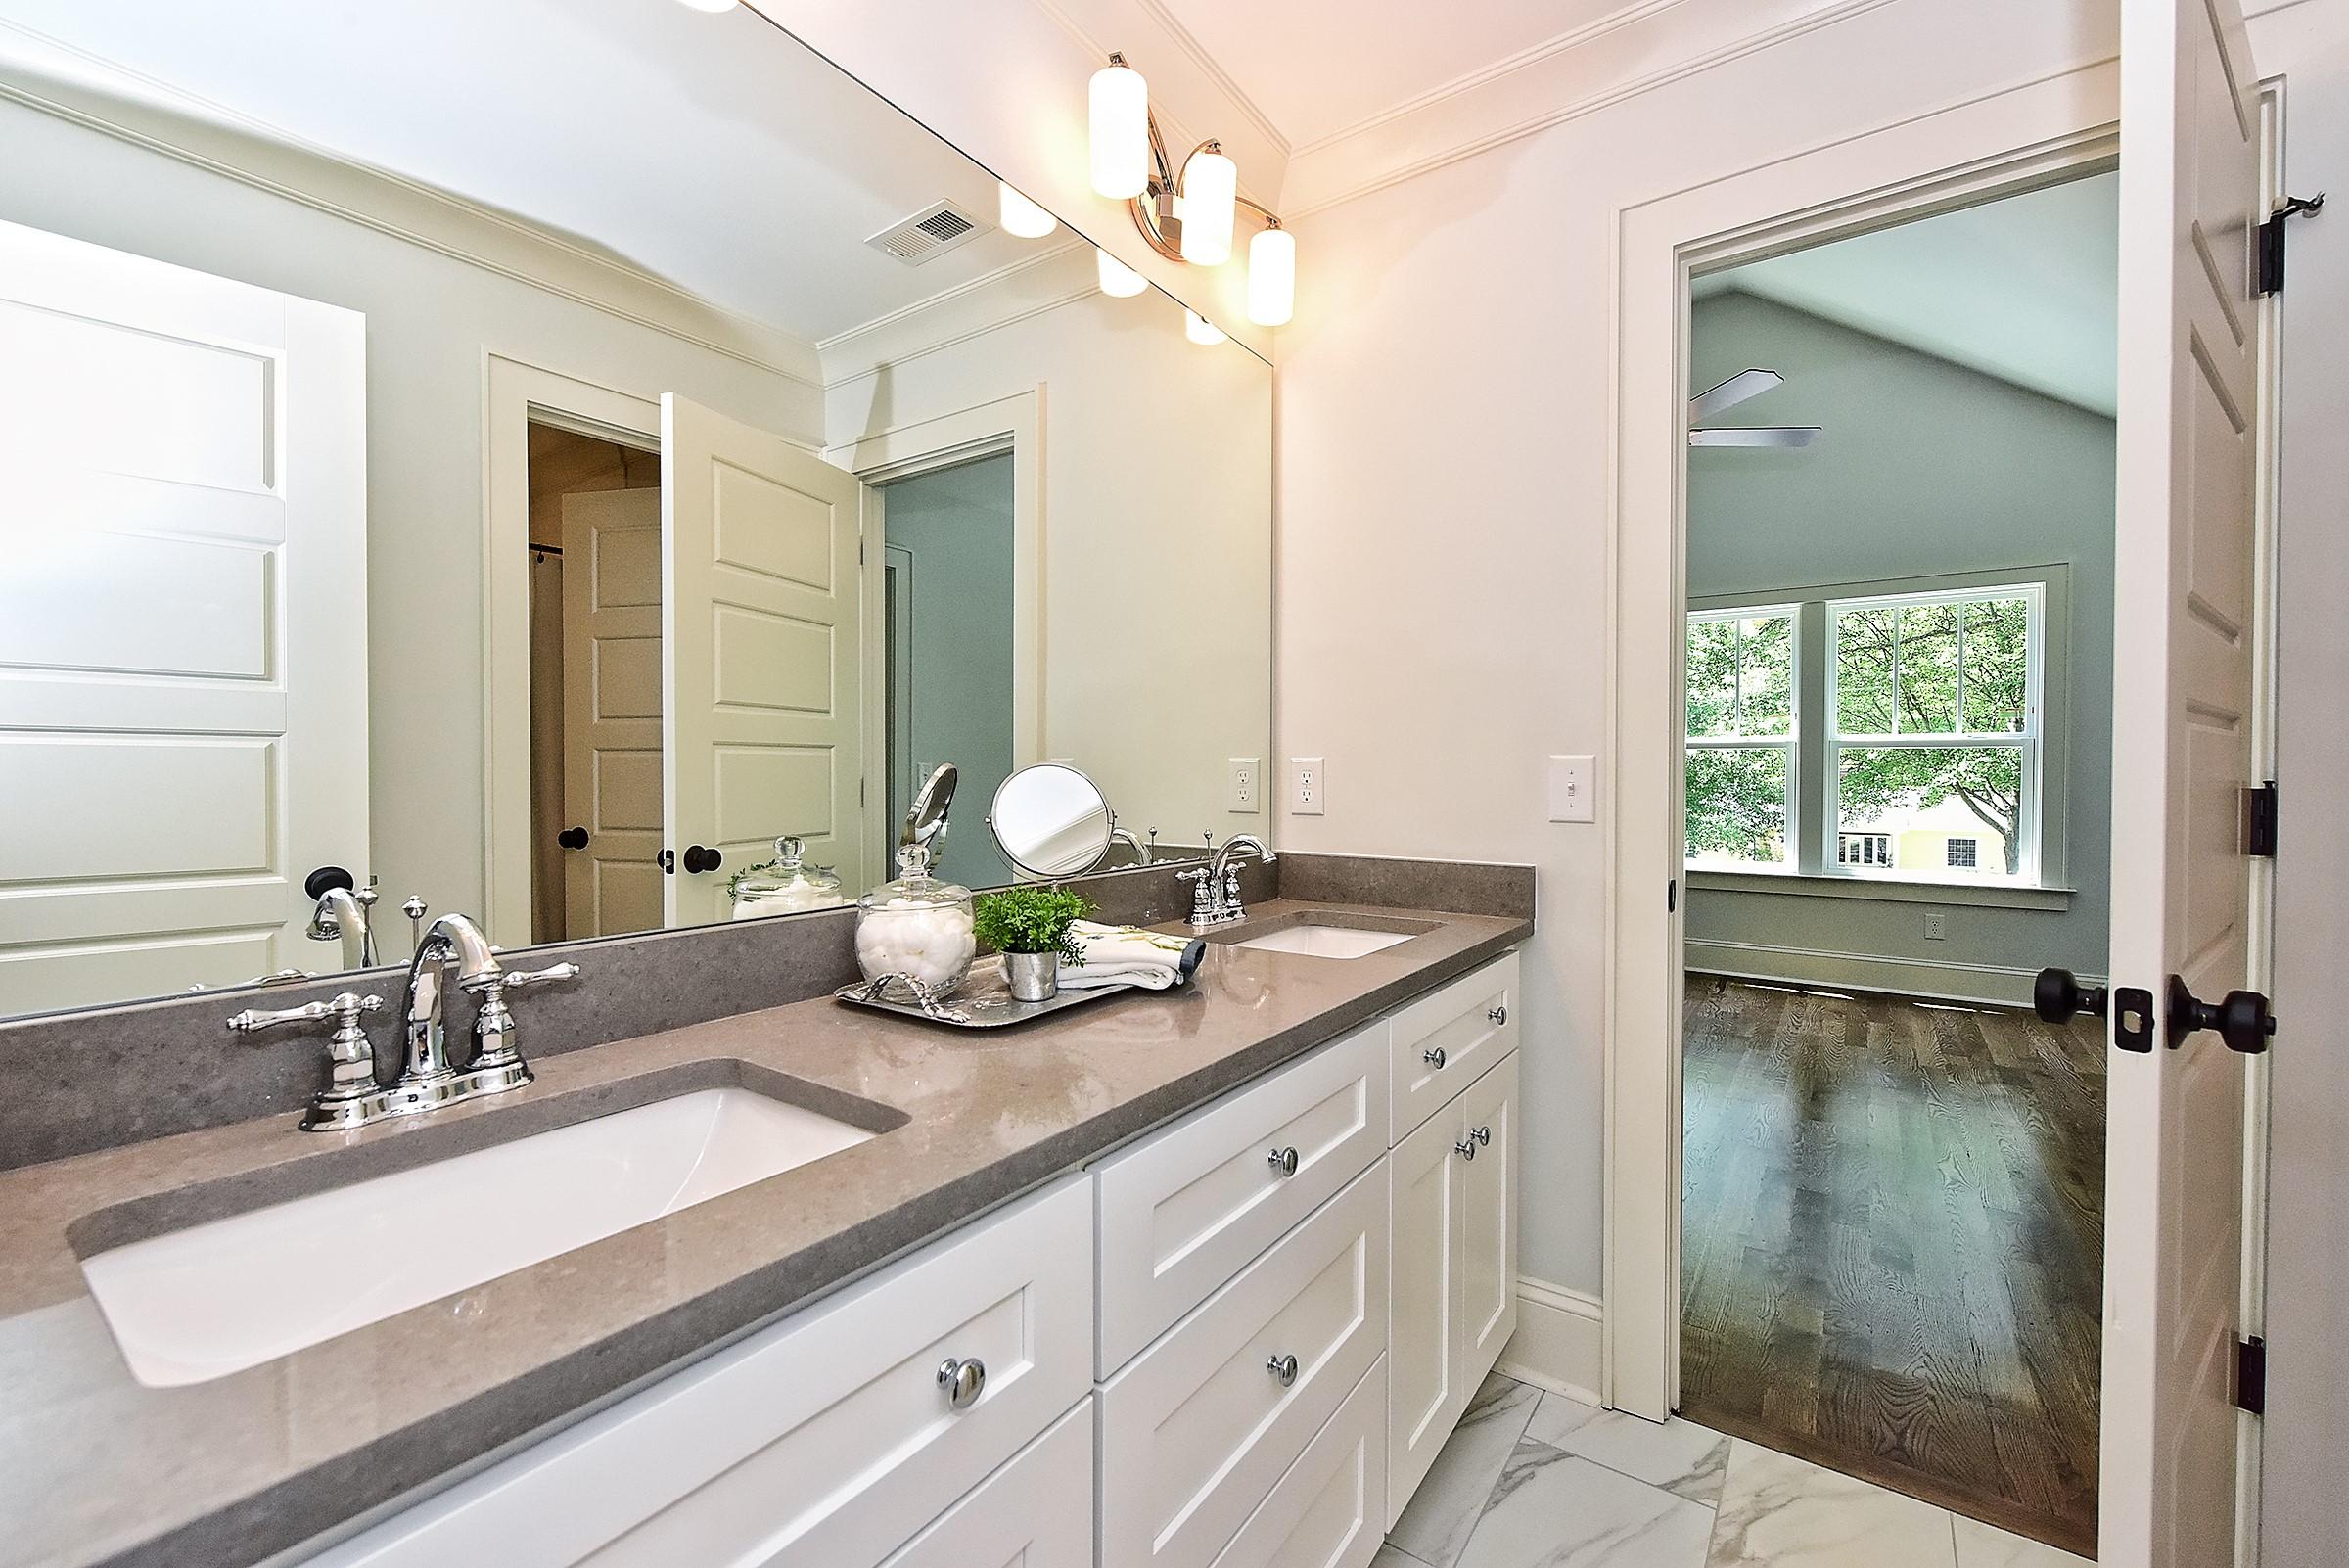 046_Bathroom.jpg